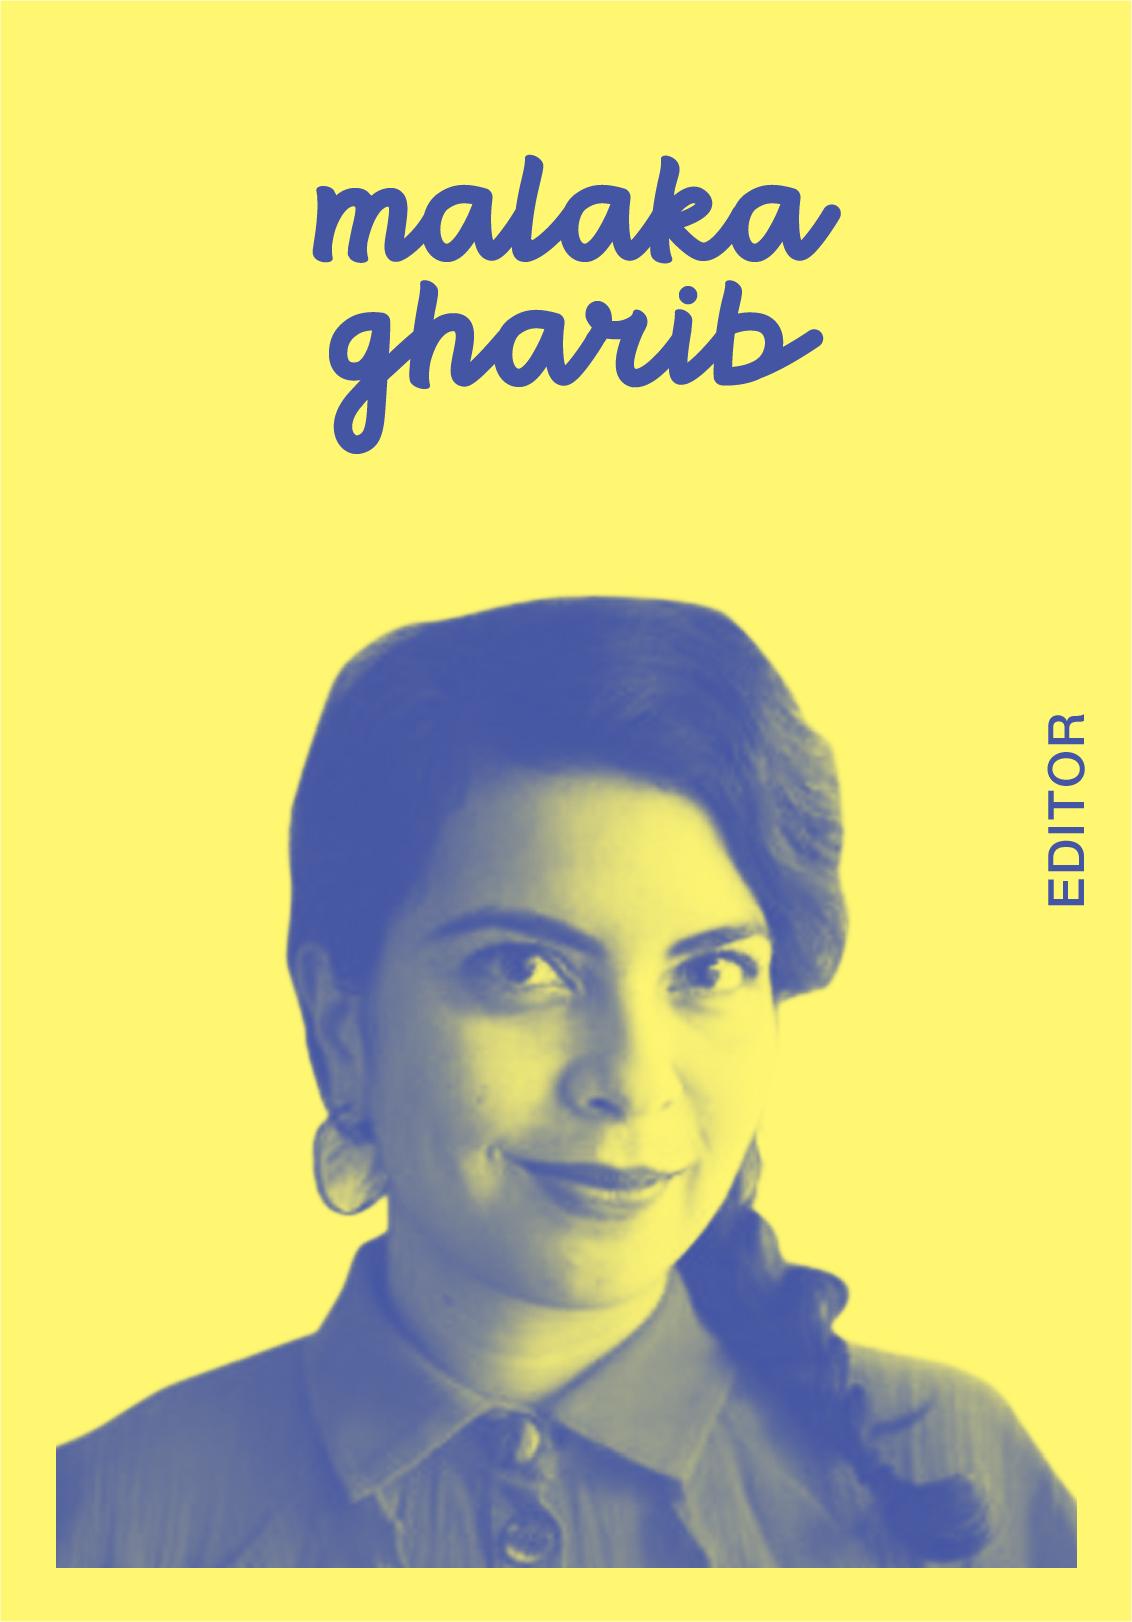 Malaka Gharib   @MALAKAGHARIB   IG: MALAKAGHARIB